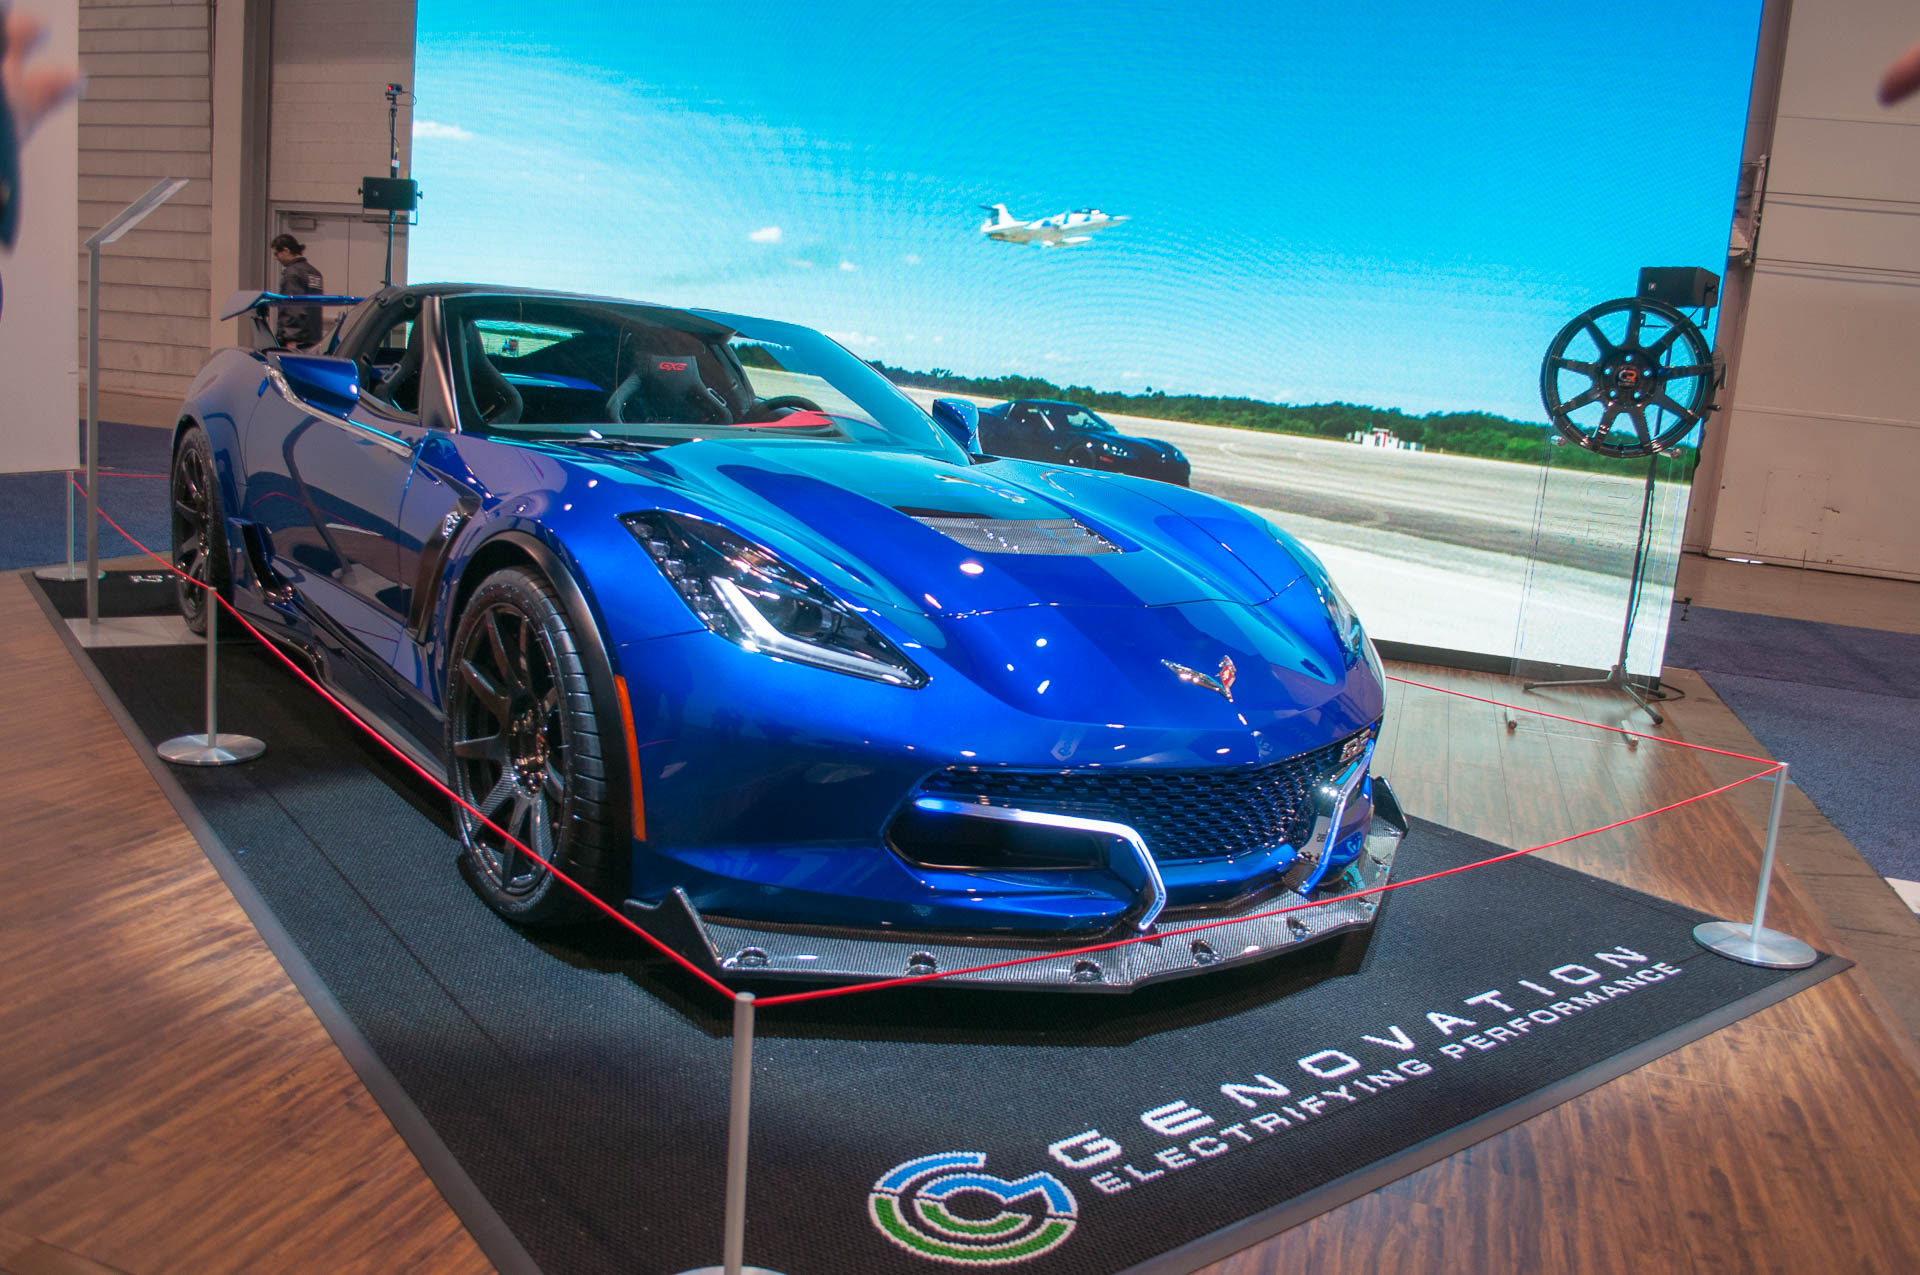 Genovation's 800-horsepower Corvette EV debuts at 2018 CES